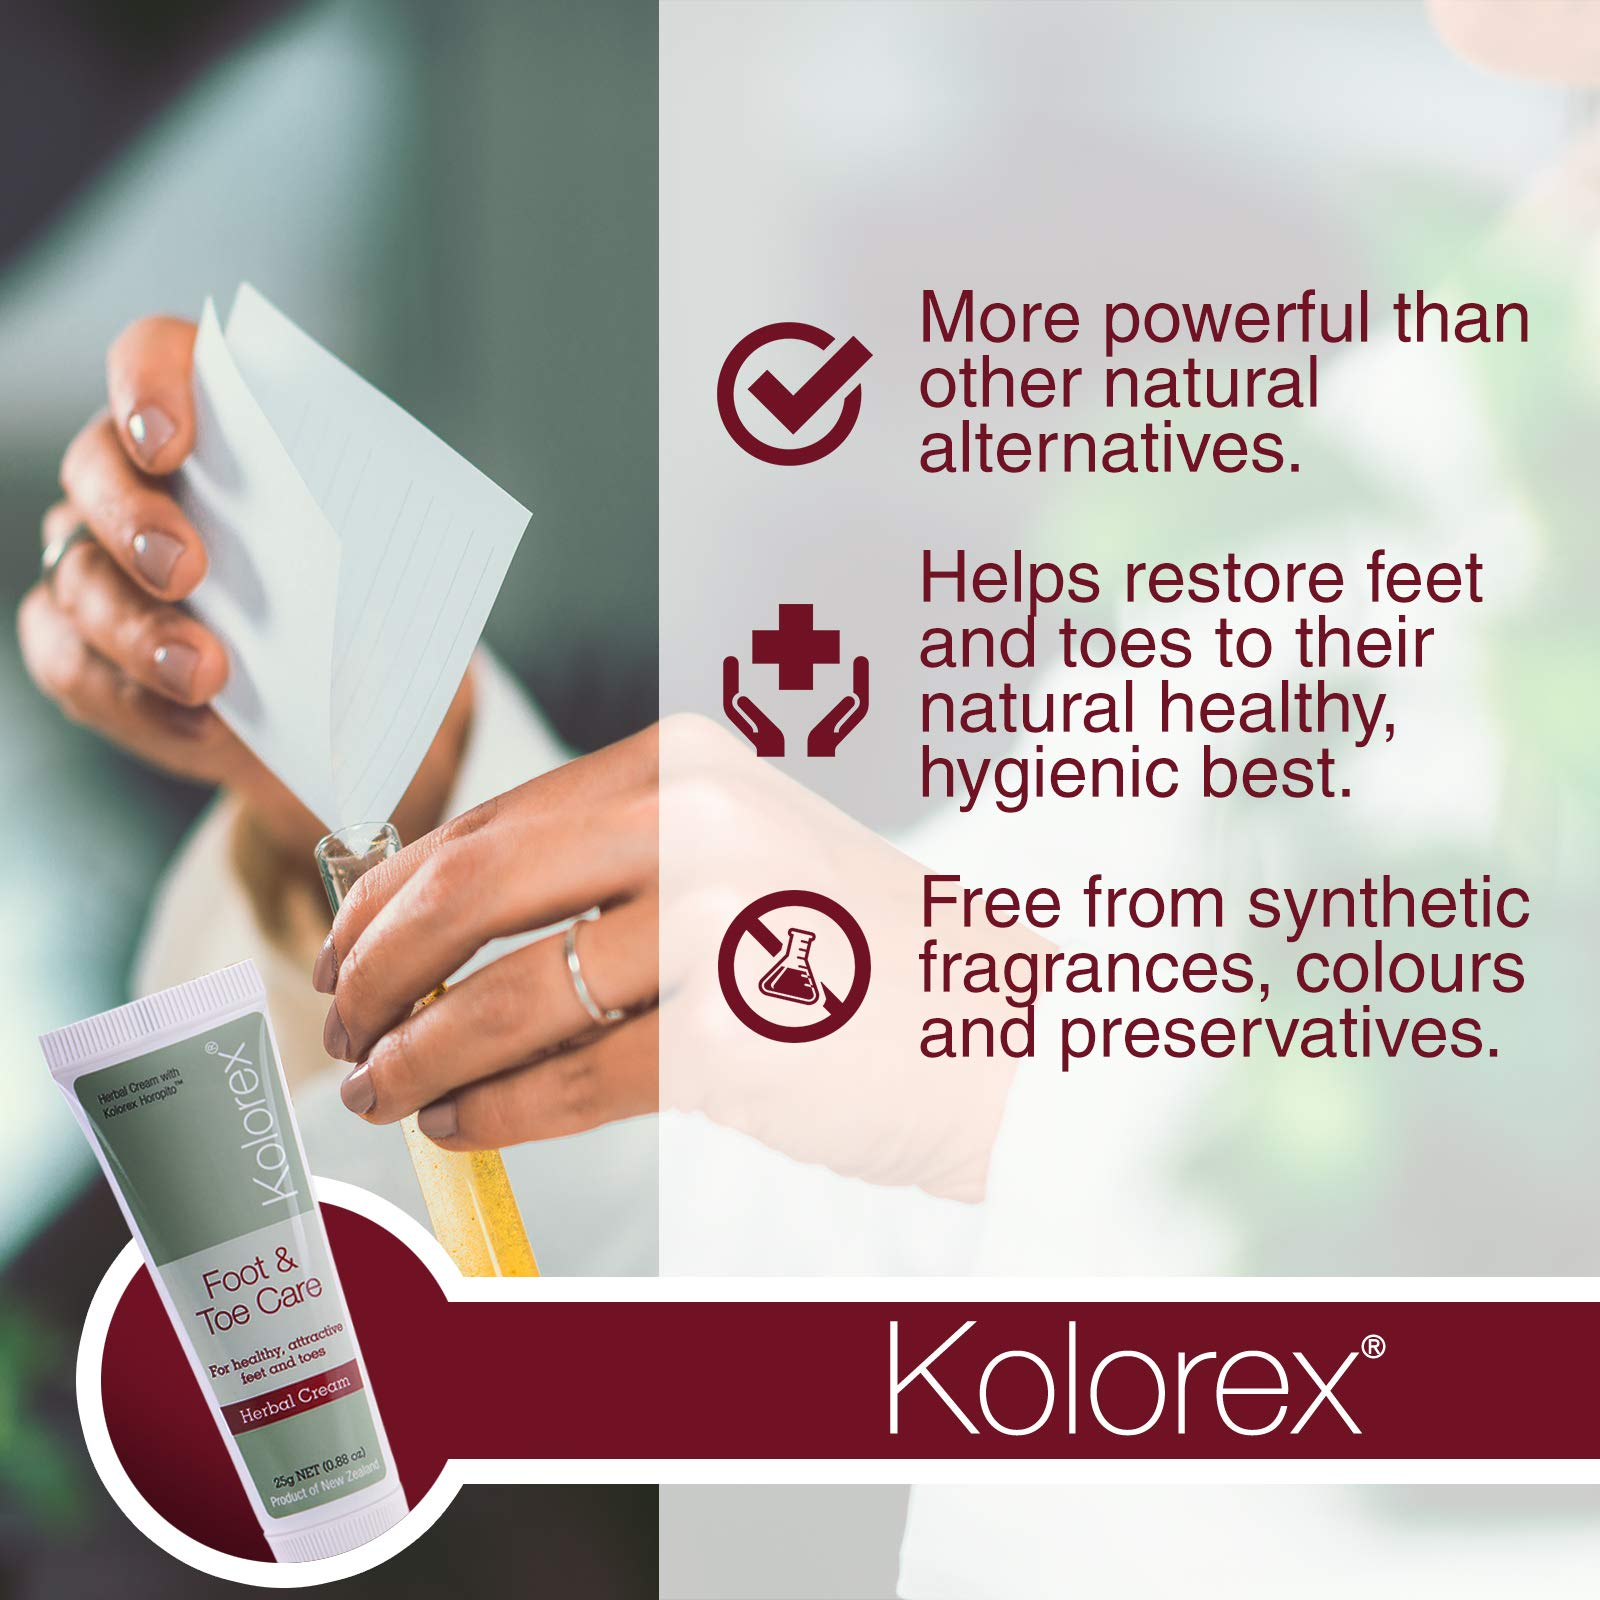 Kolorex Foot & Toe Care Cream 25gm by Kolorex (Image #3)